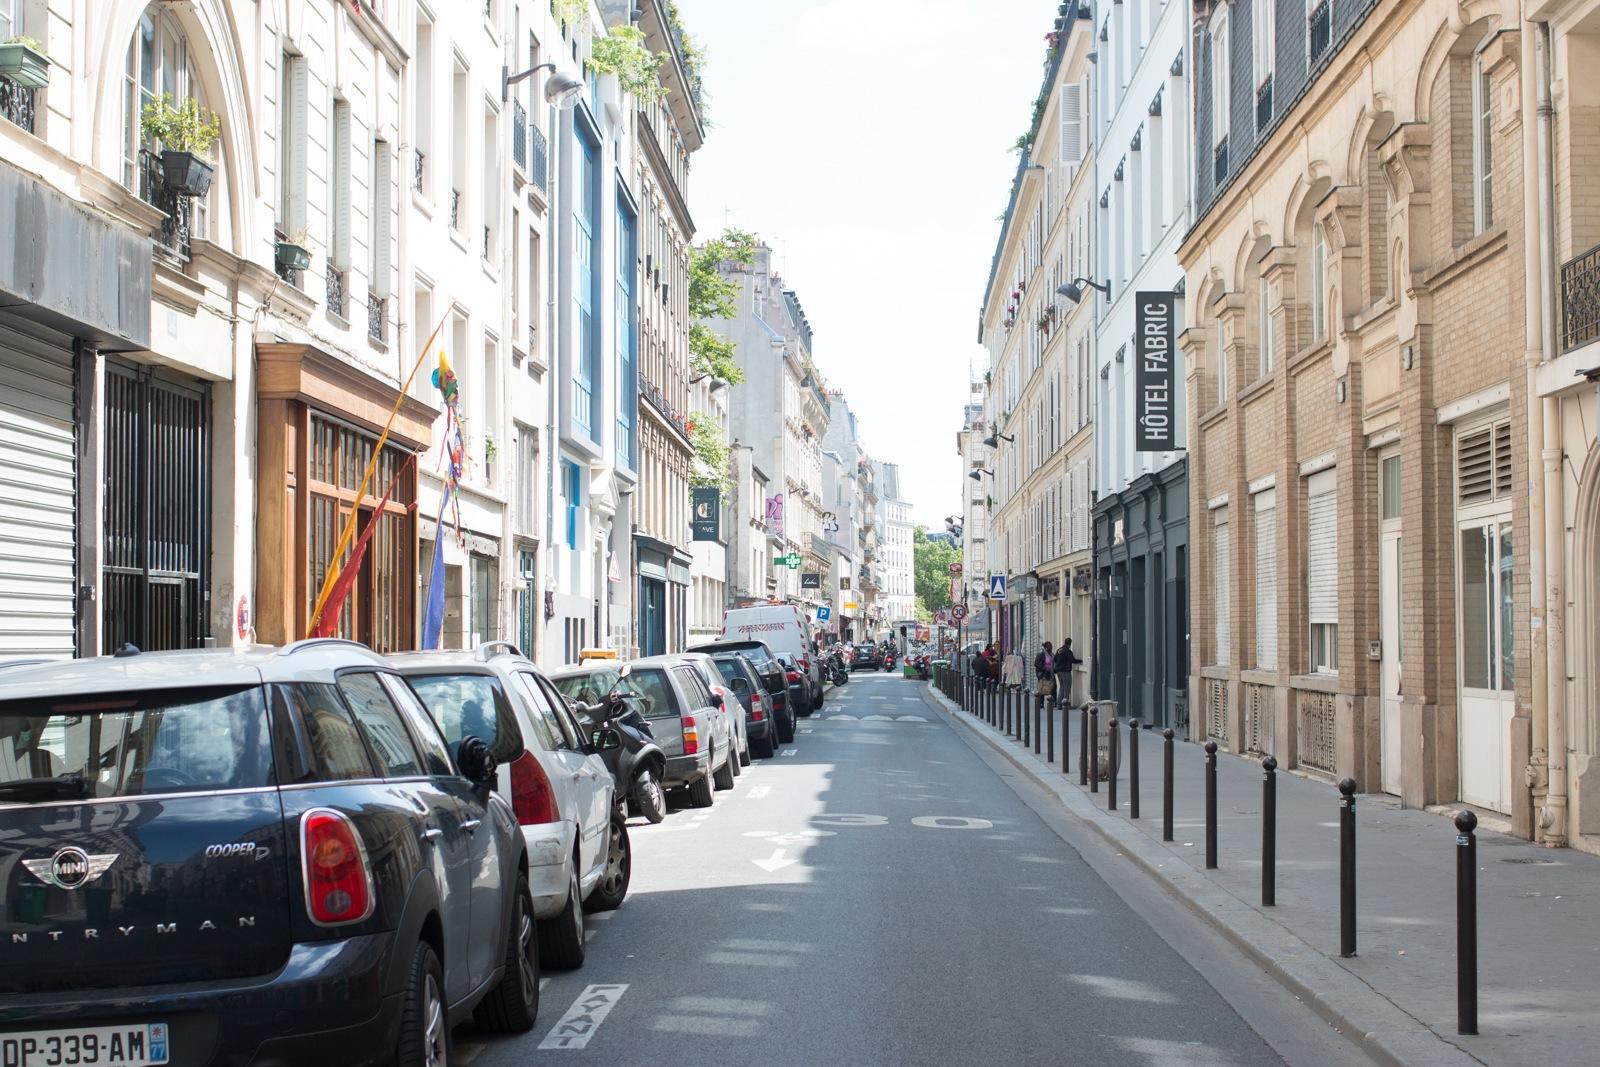 Maison Popincourt strolling paris' still-shifting 11th: rue popincourt & rue de la